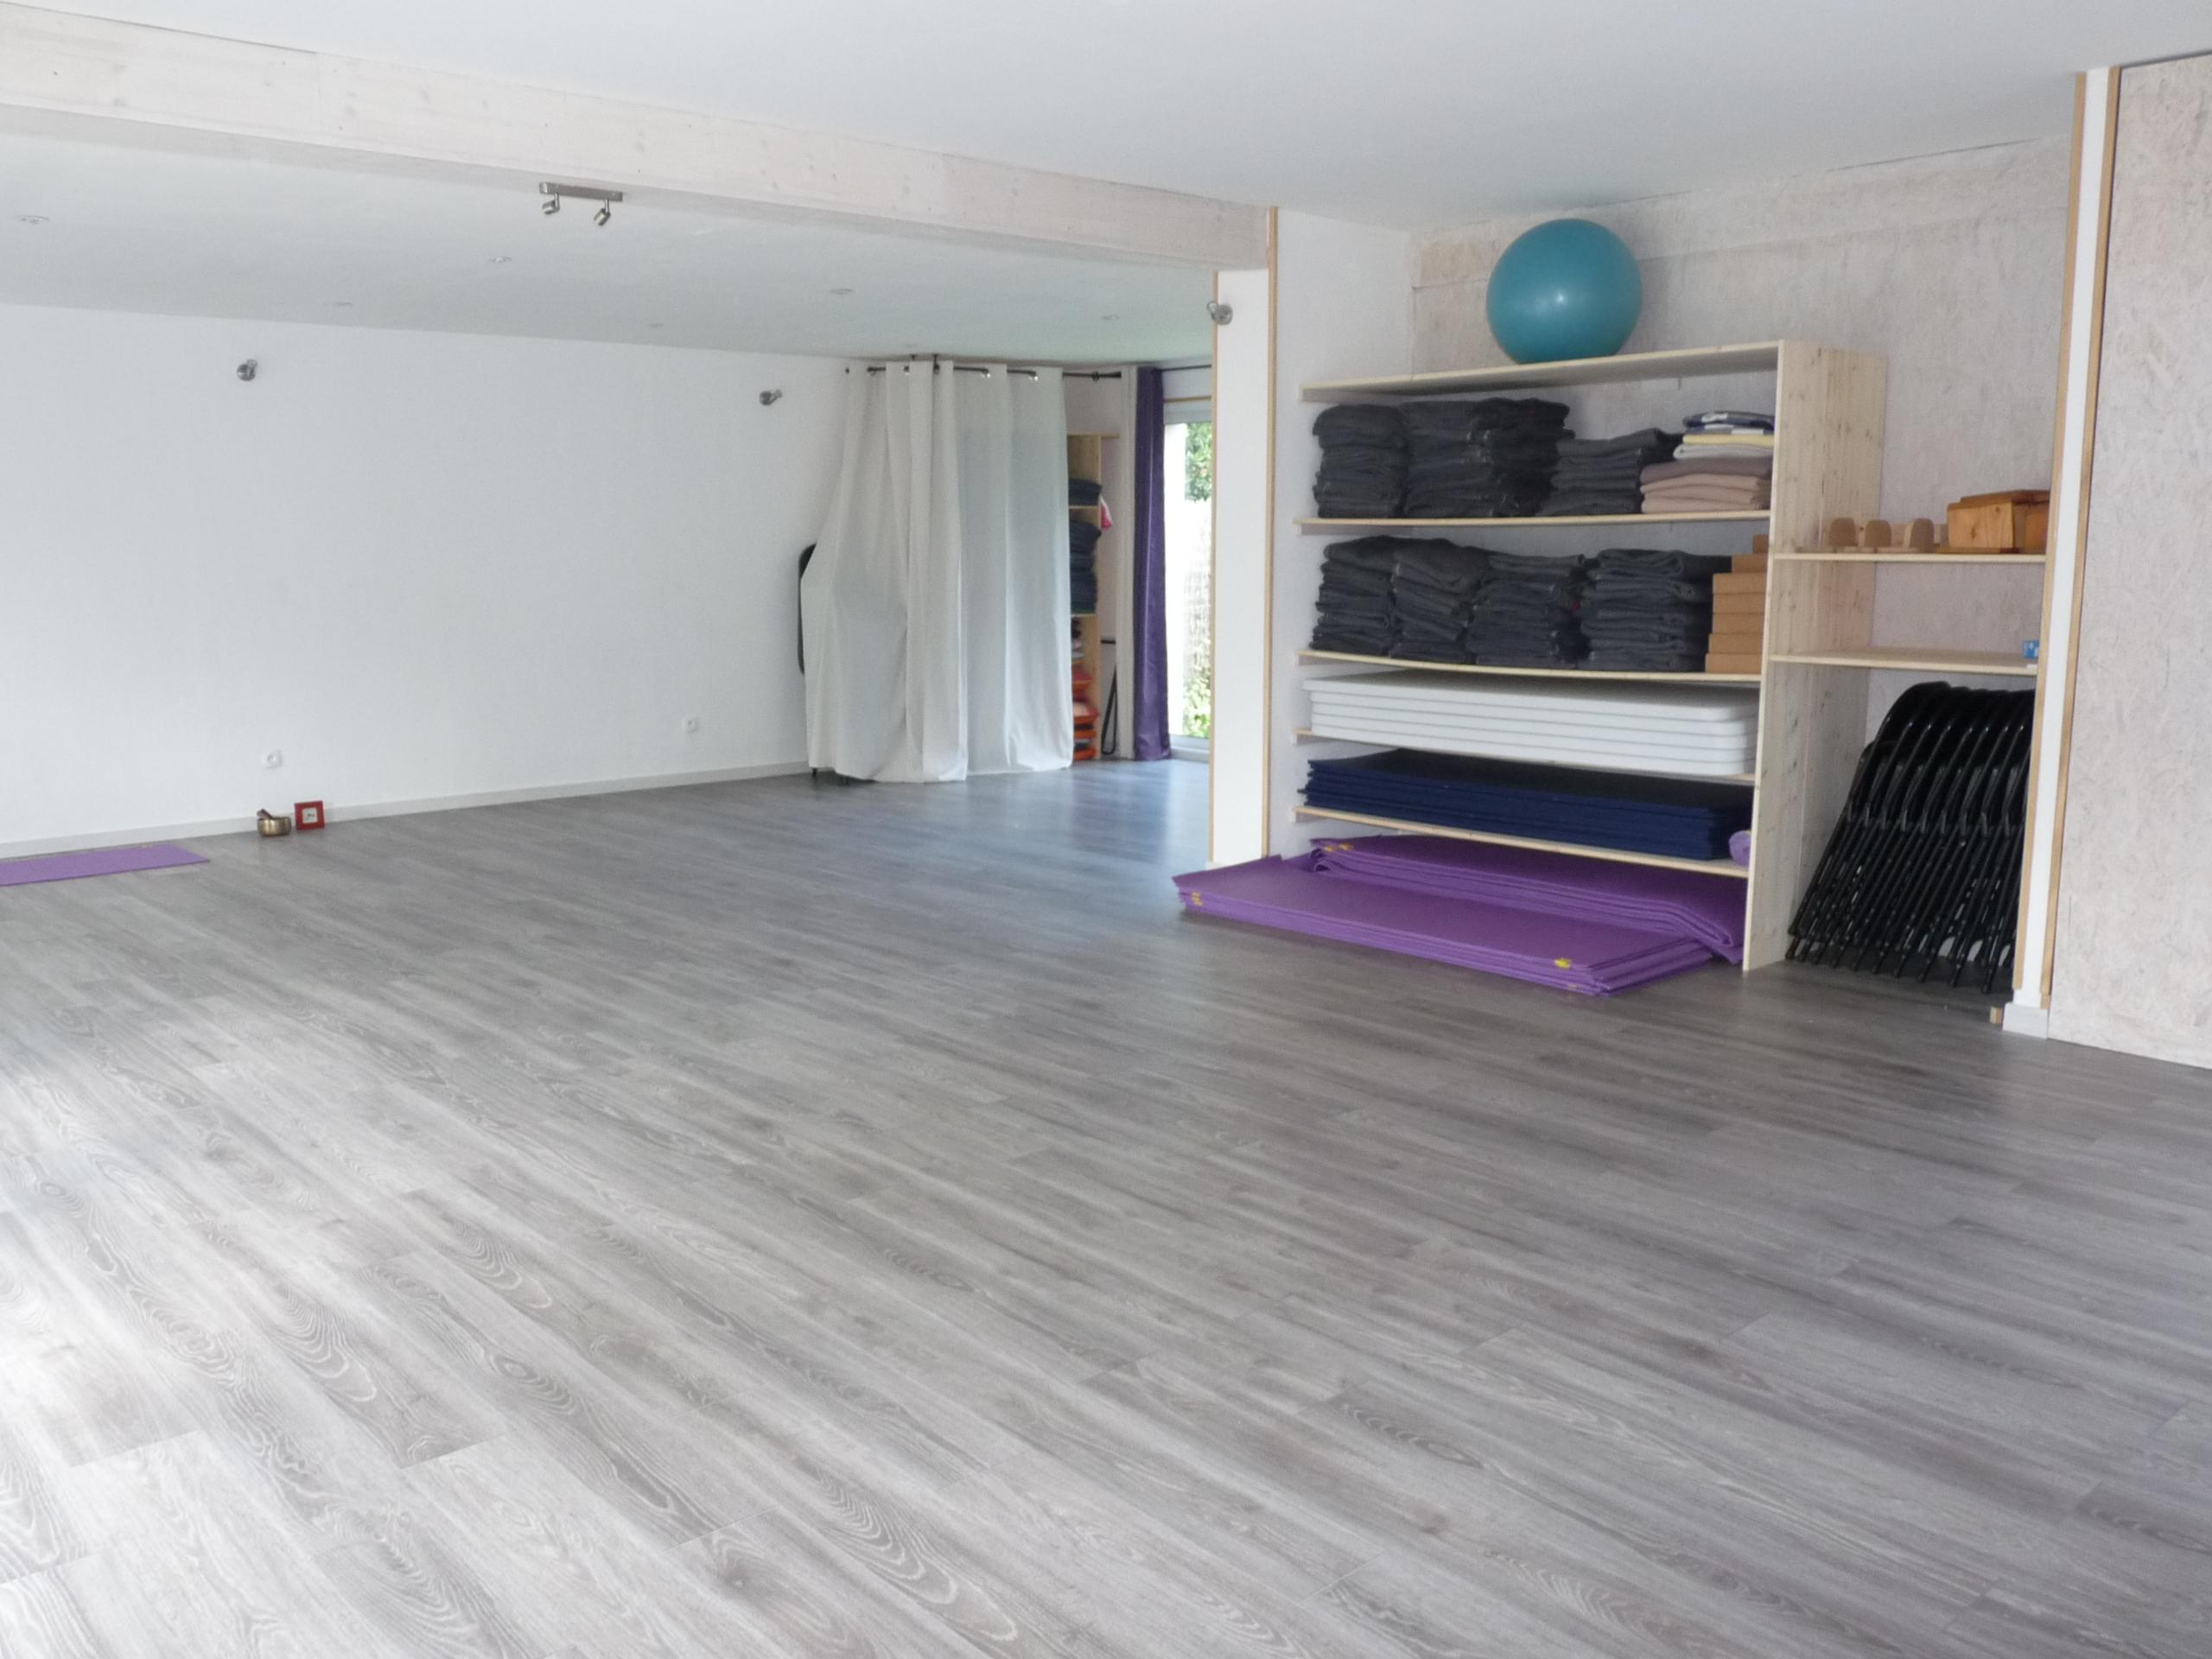 Salle yoga vue mur est rangement